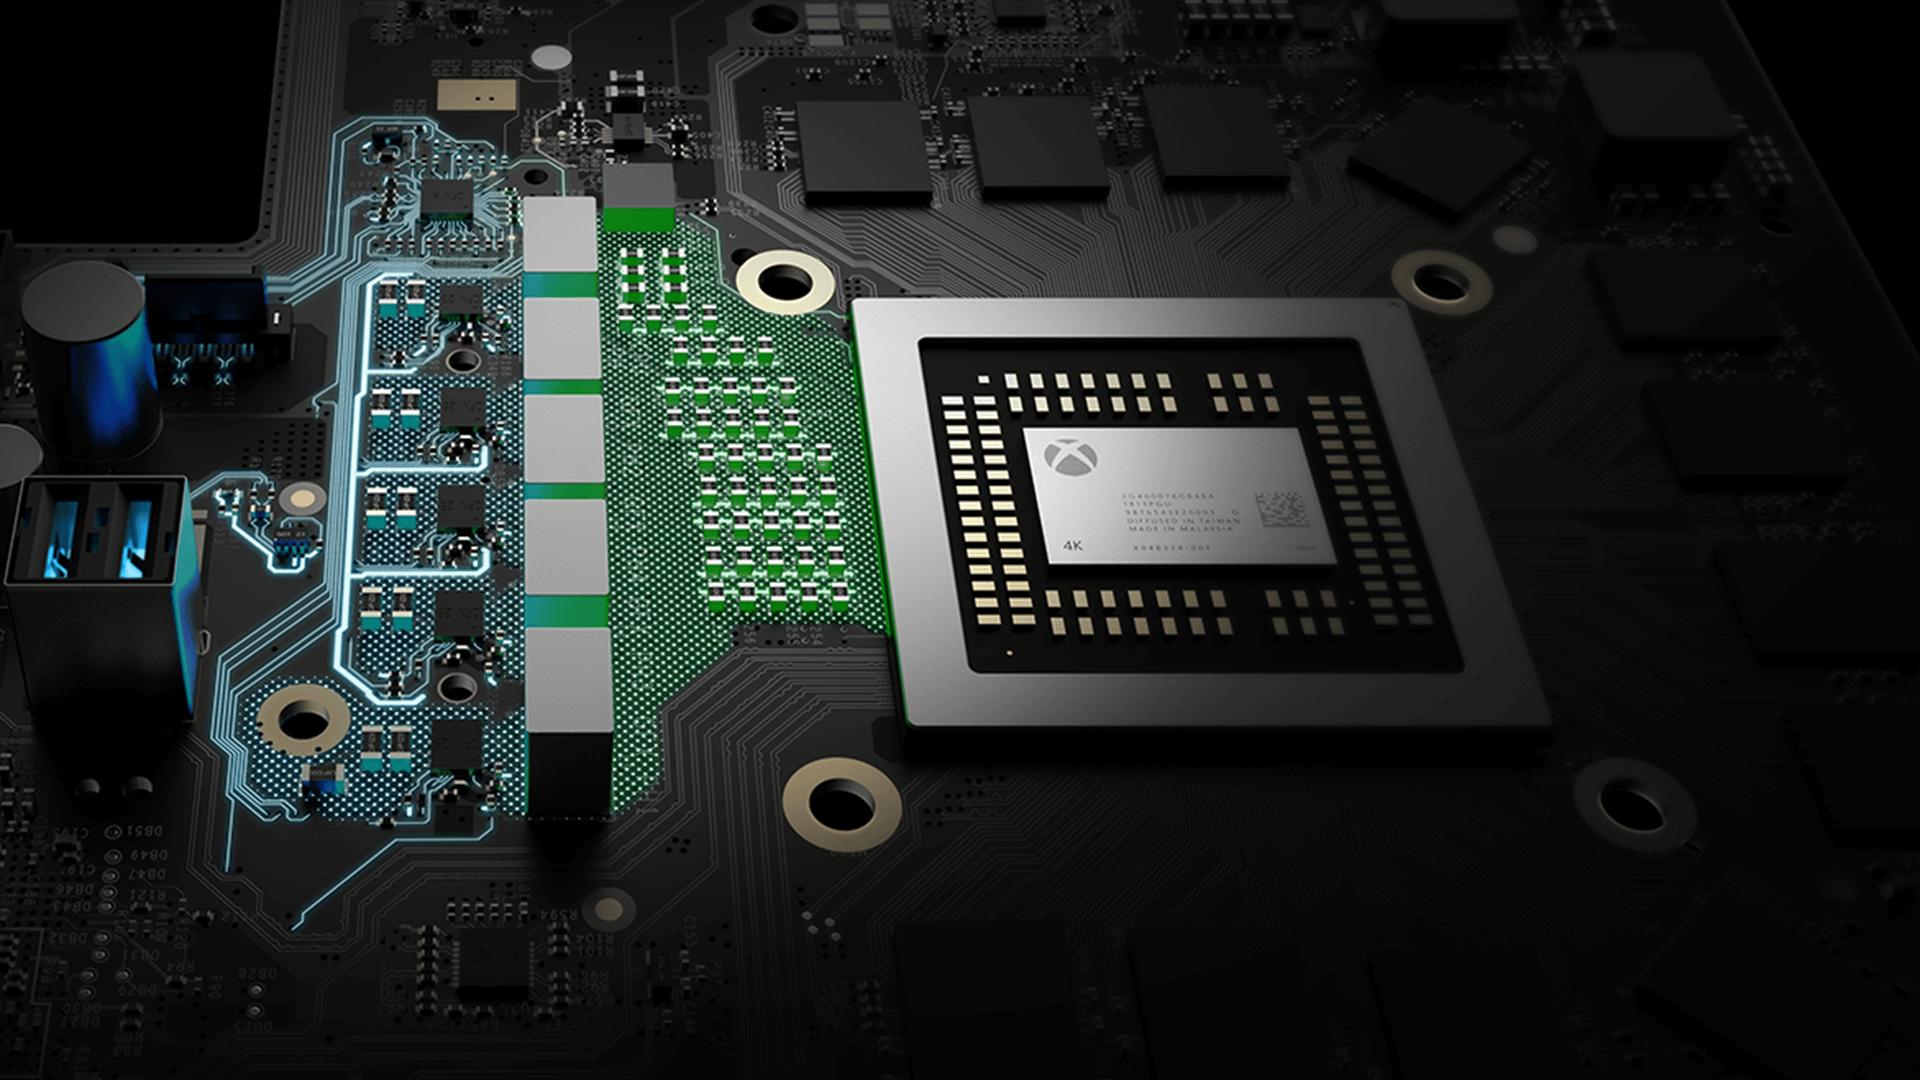 Press invites confirm Project Scorpio to be unveiled at E3 2017 1